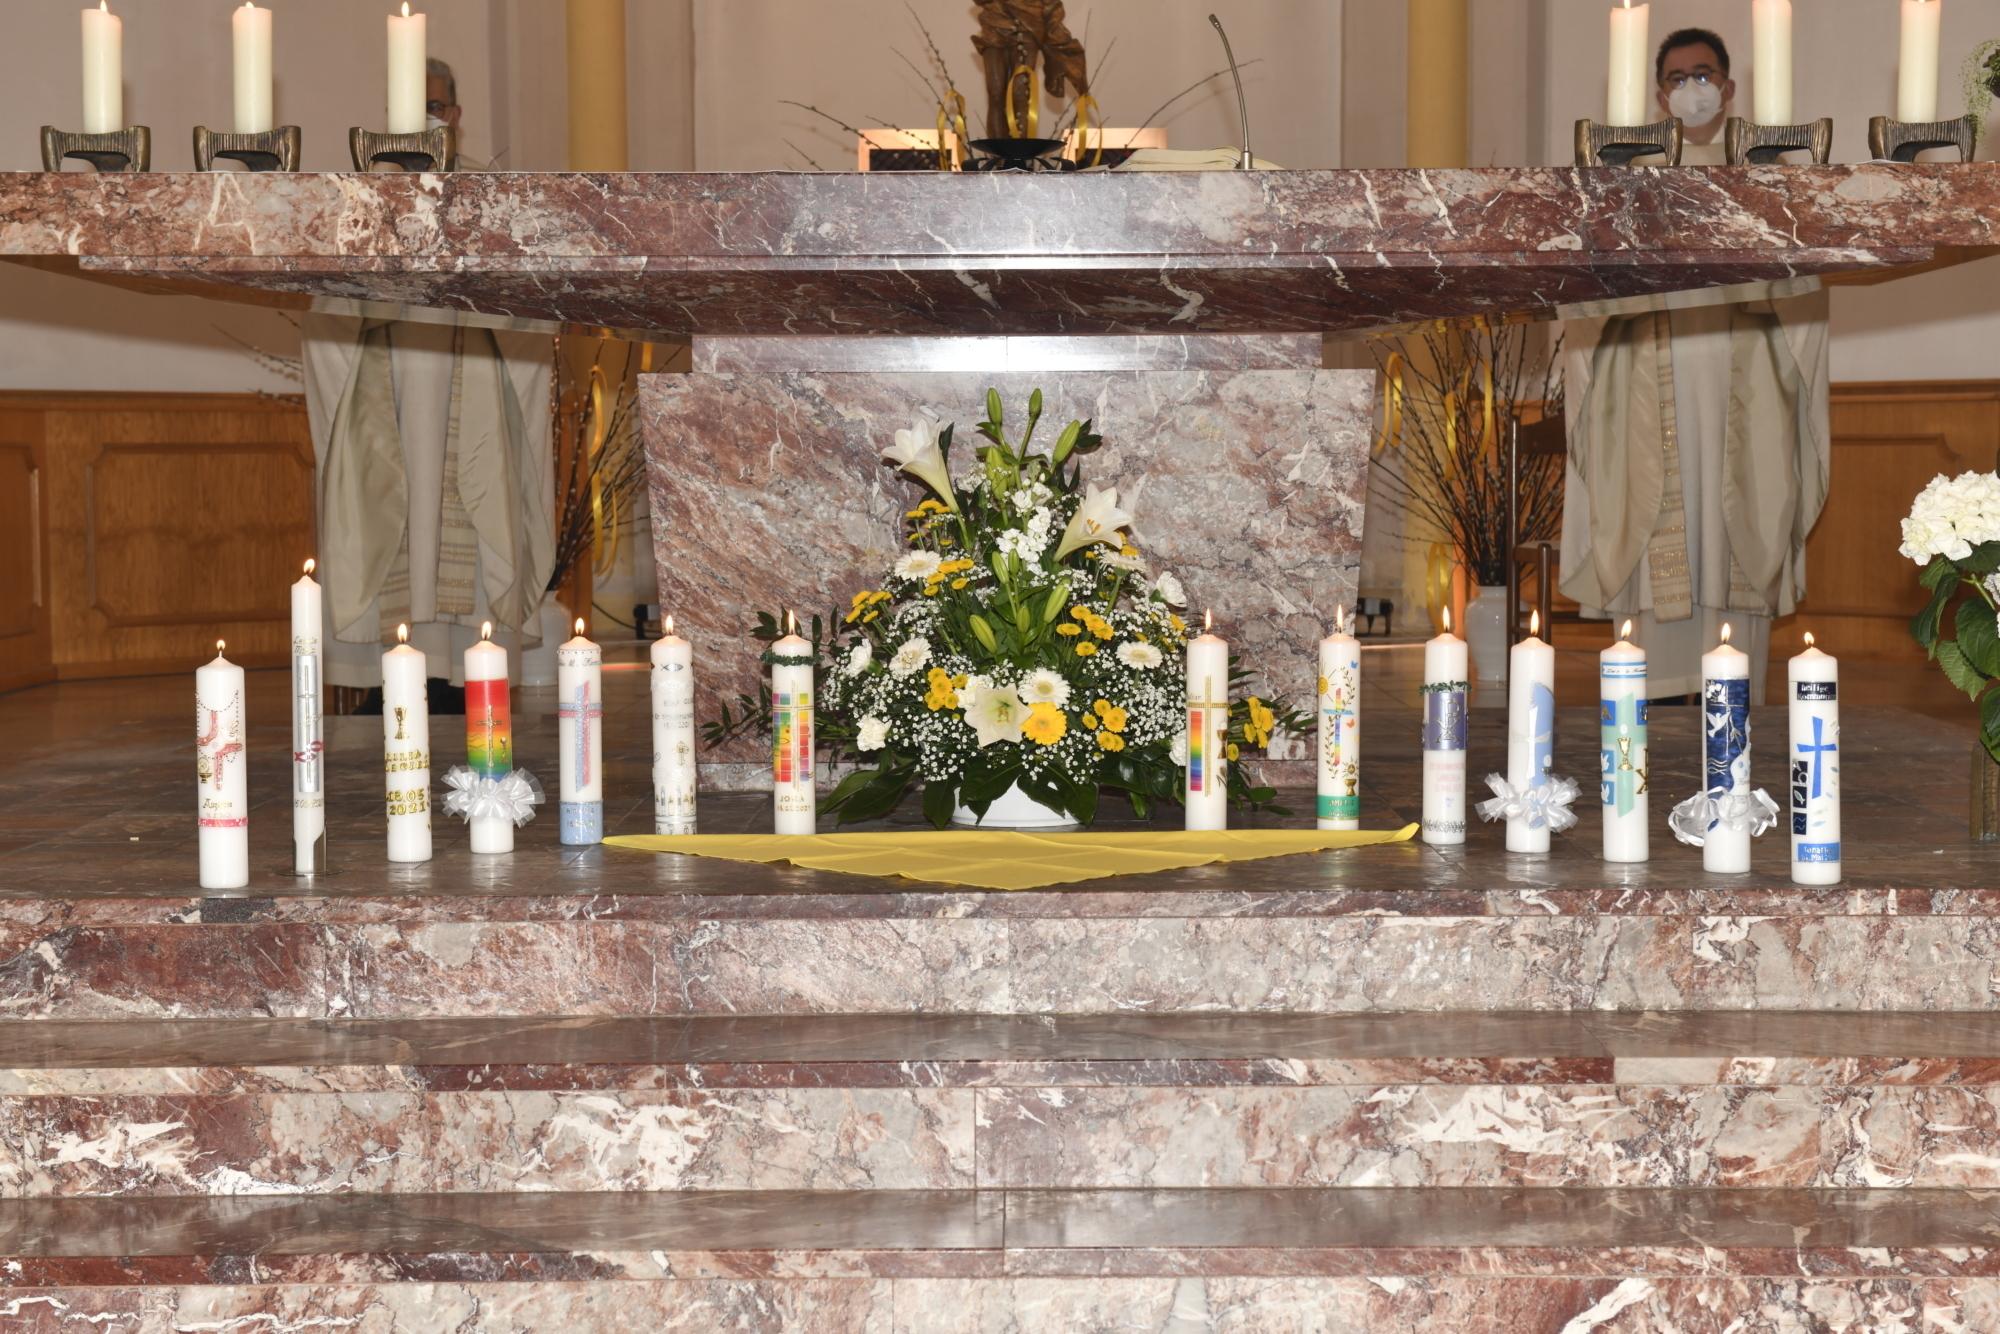 2021 Erstkommunion 5 Kommunionkerzen St Marien